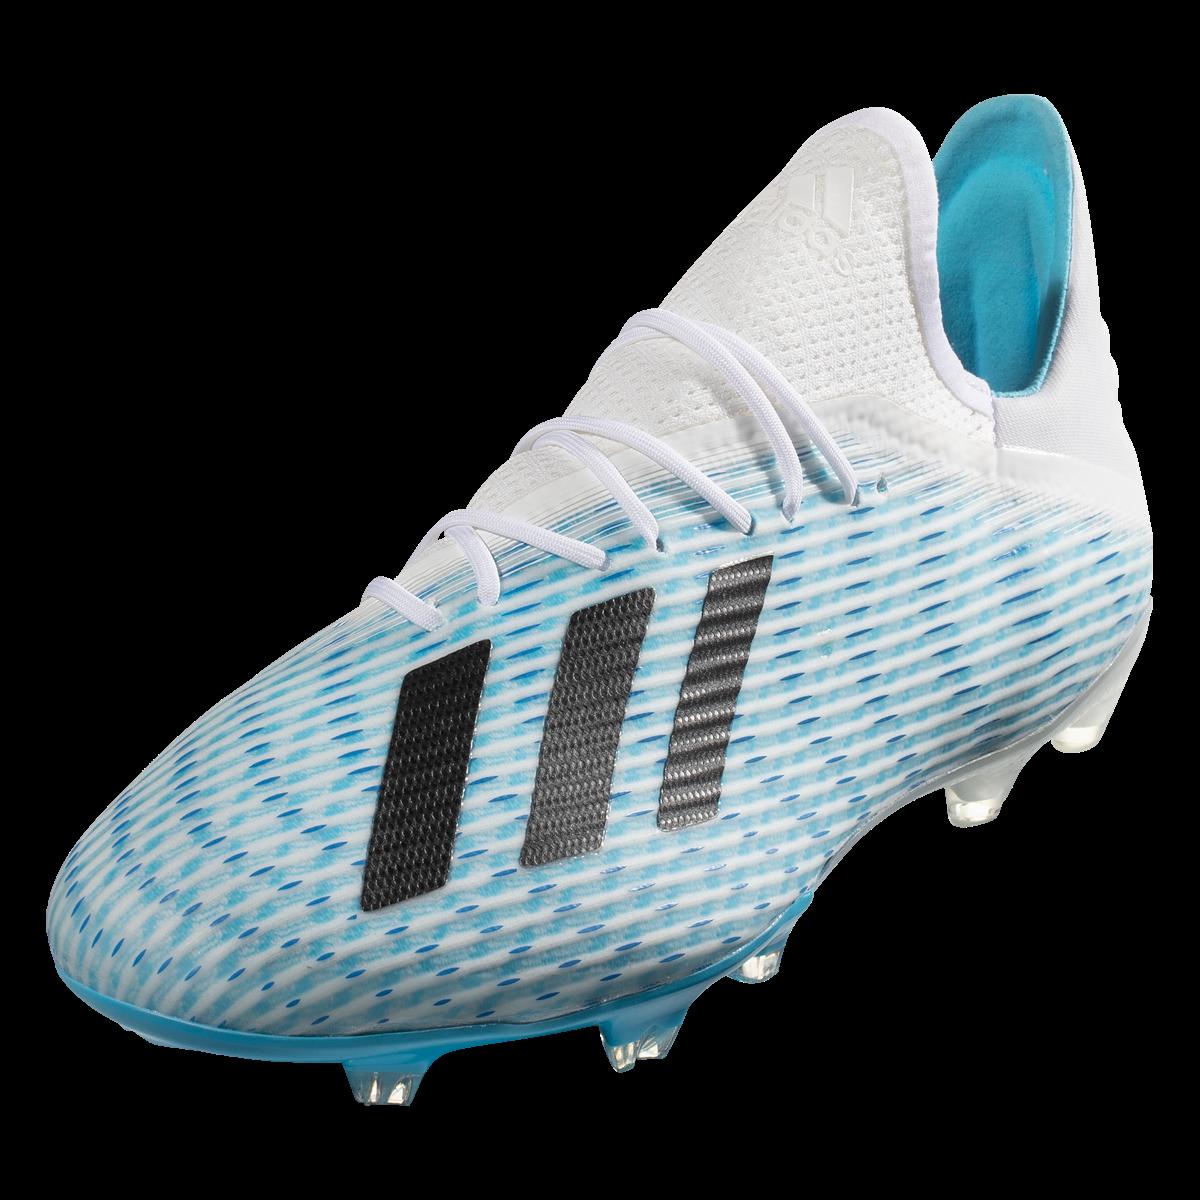 Adidas X 19 2 Fg Soccer Cleats Cyan Black Pink 13 Soccer Cleats Soccer Cleats Adidas Cleats